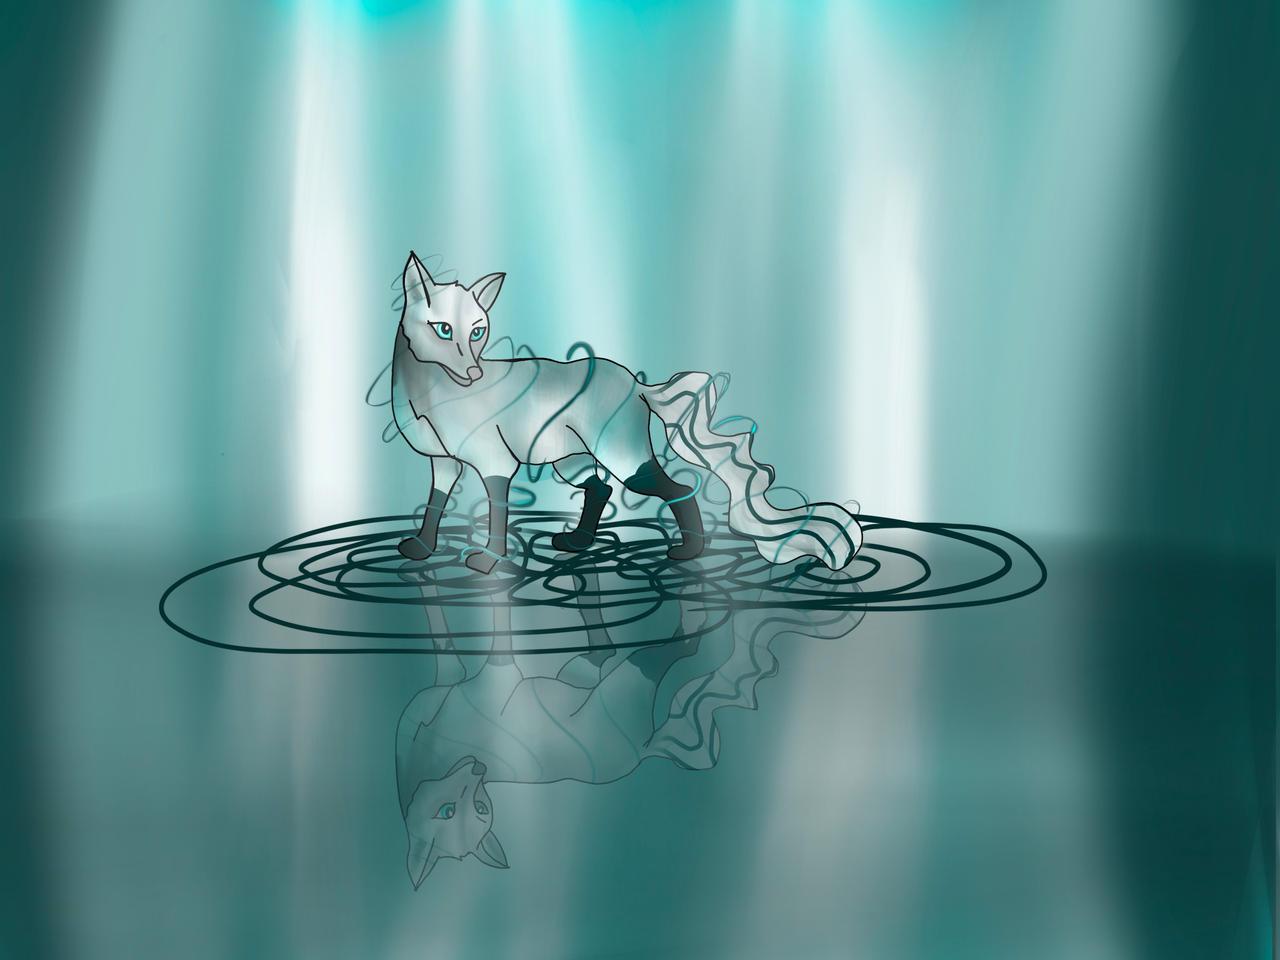 Starlit waters